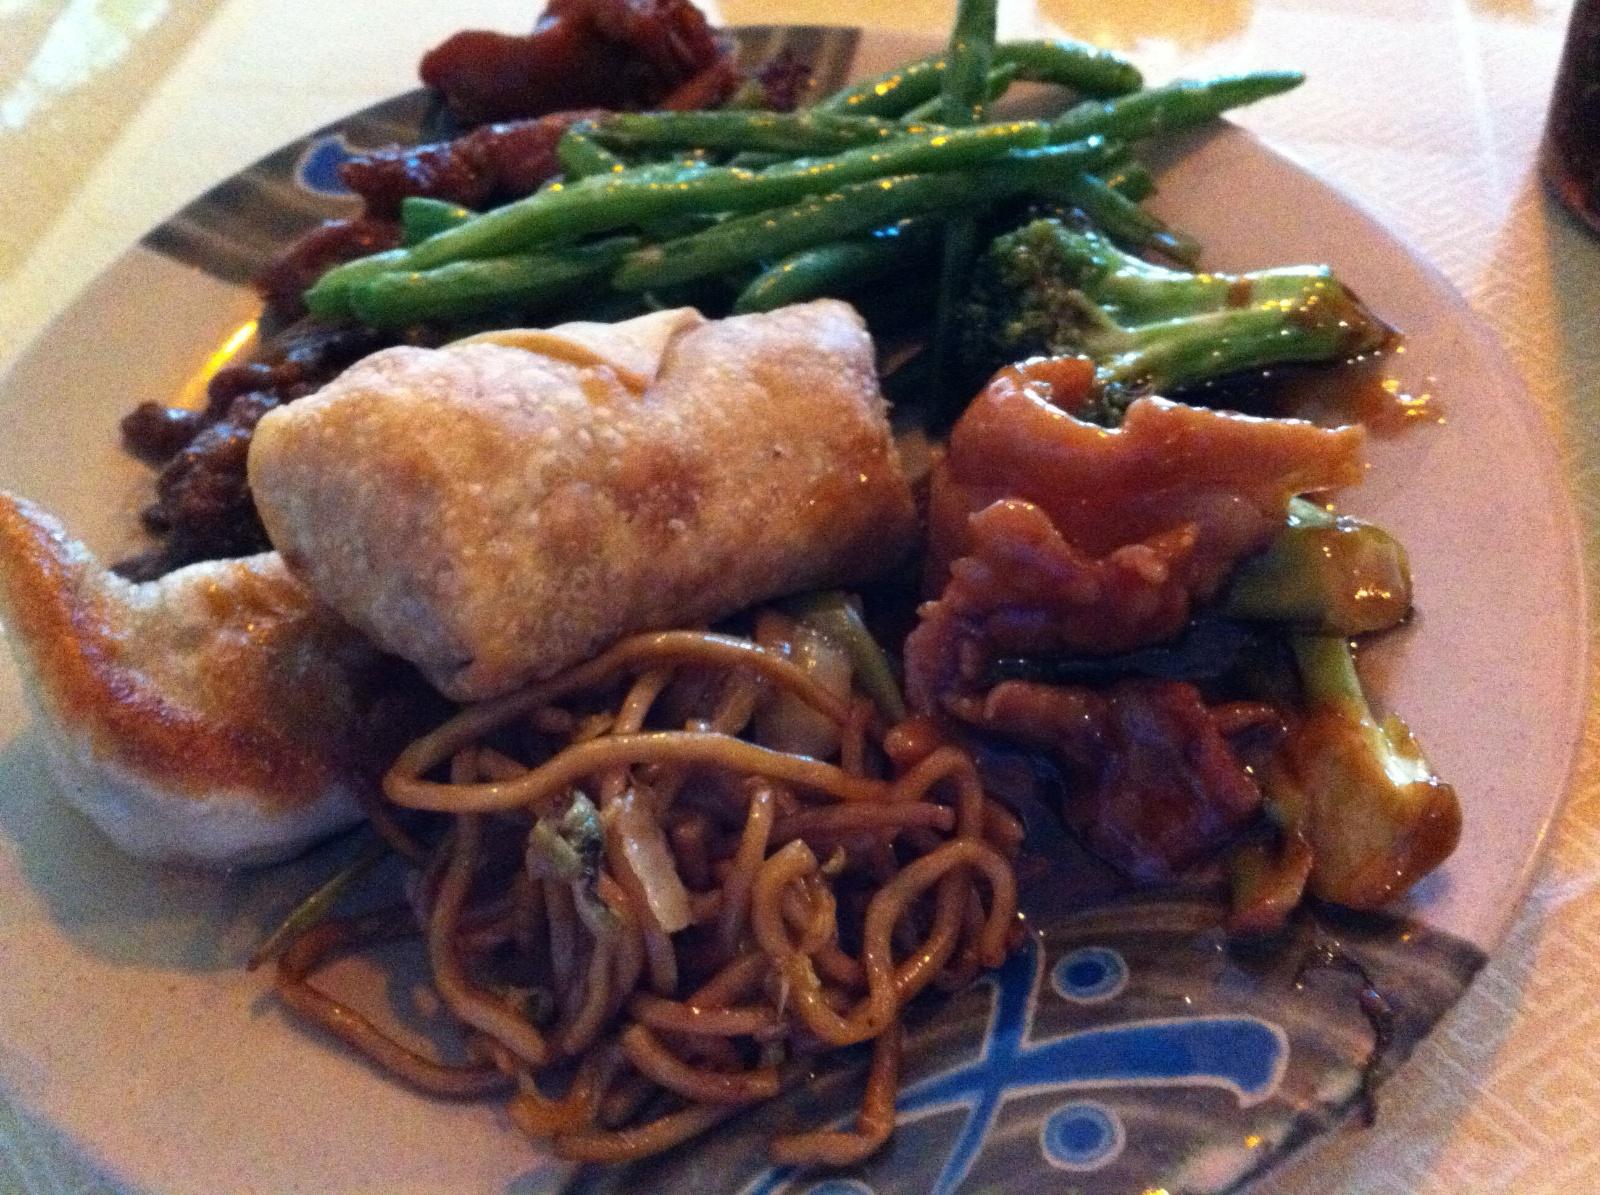 http://blog.rickk.com/food/2011/07/17/ate.2011.07.17.d1.jpg